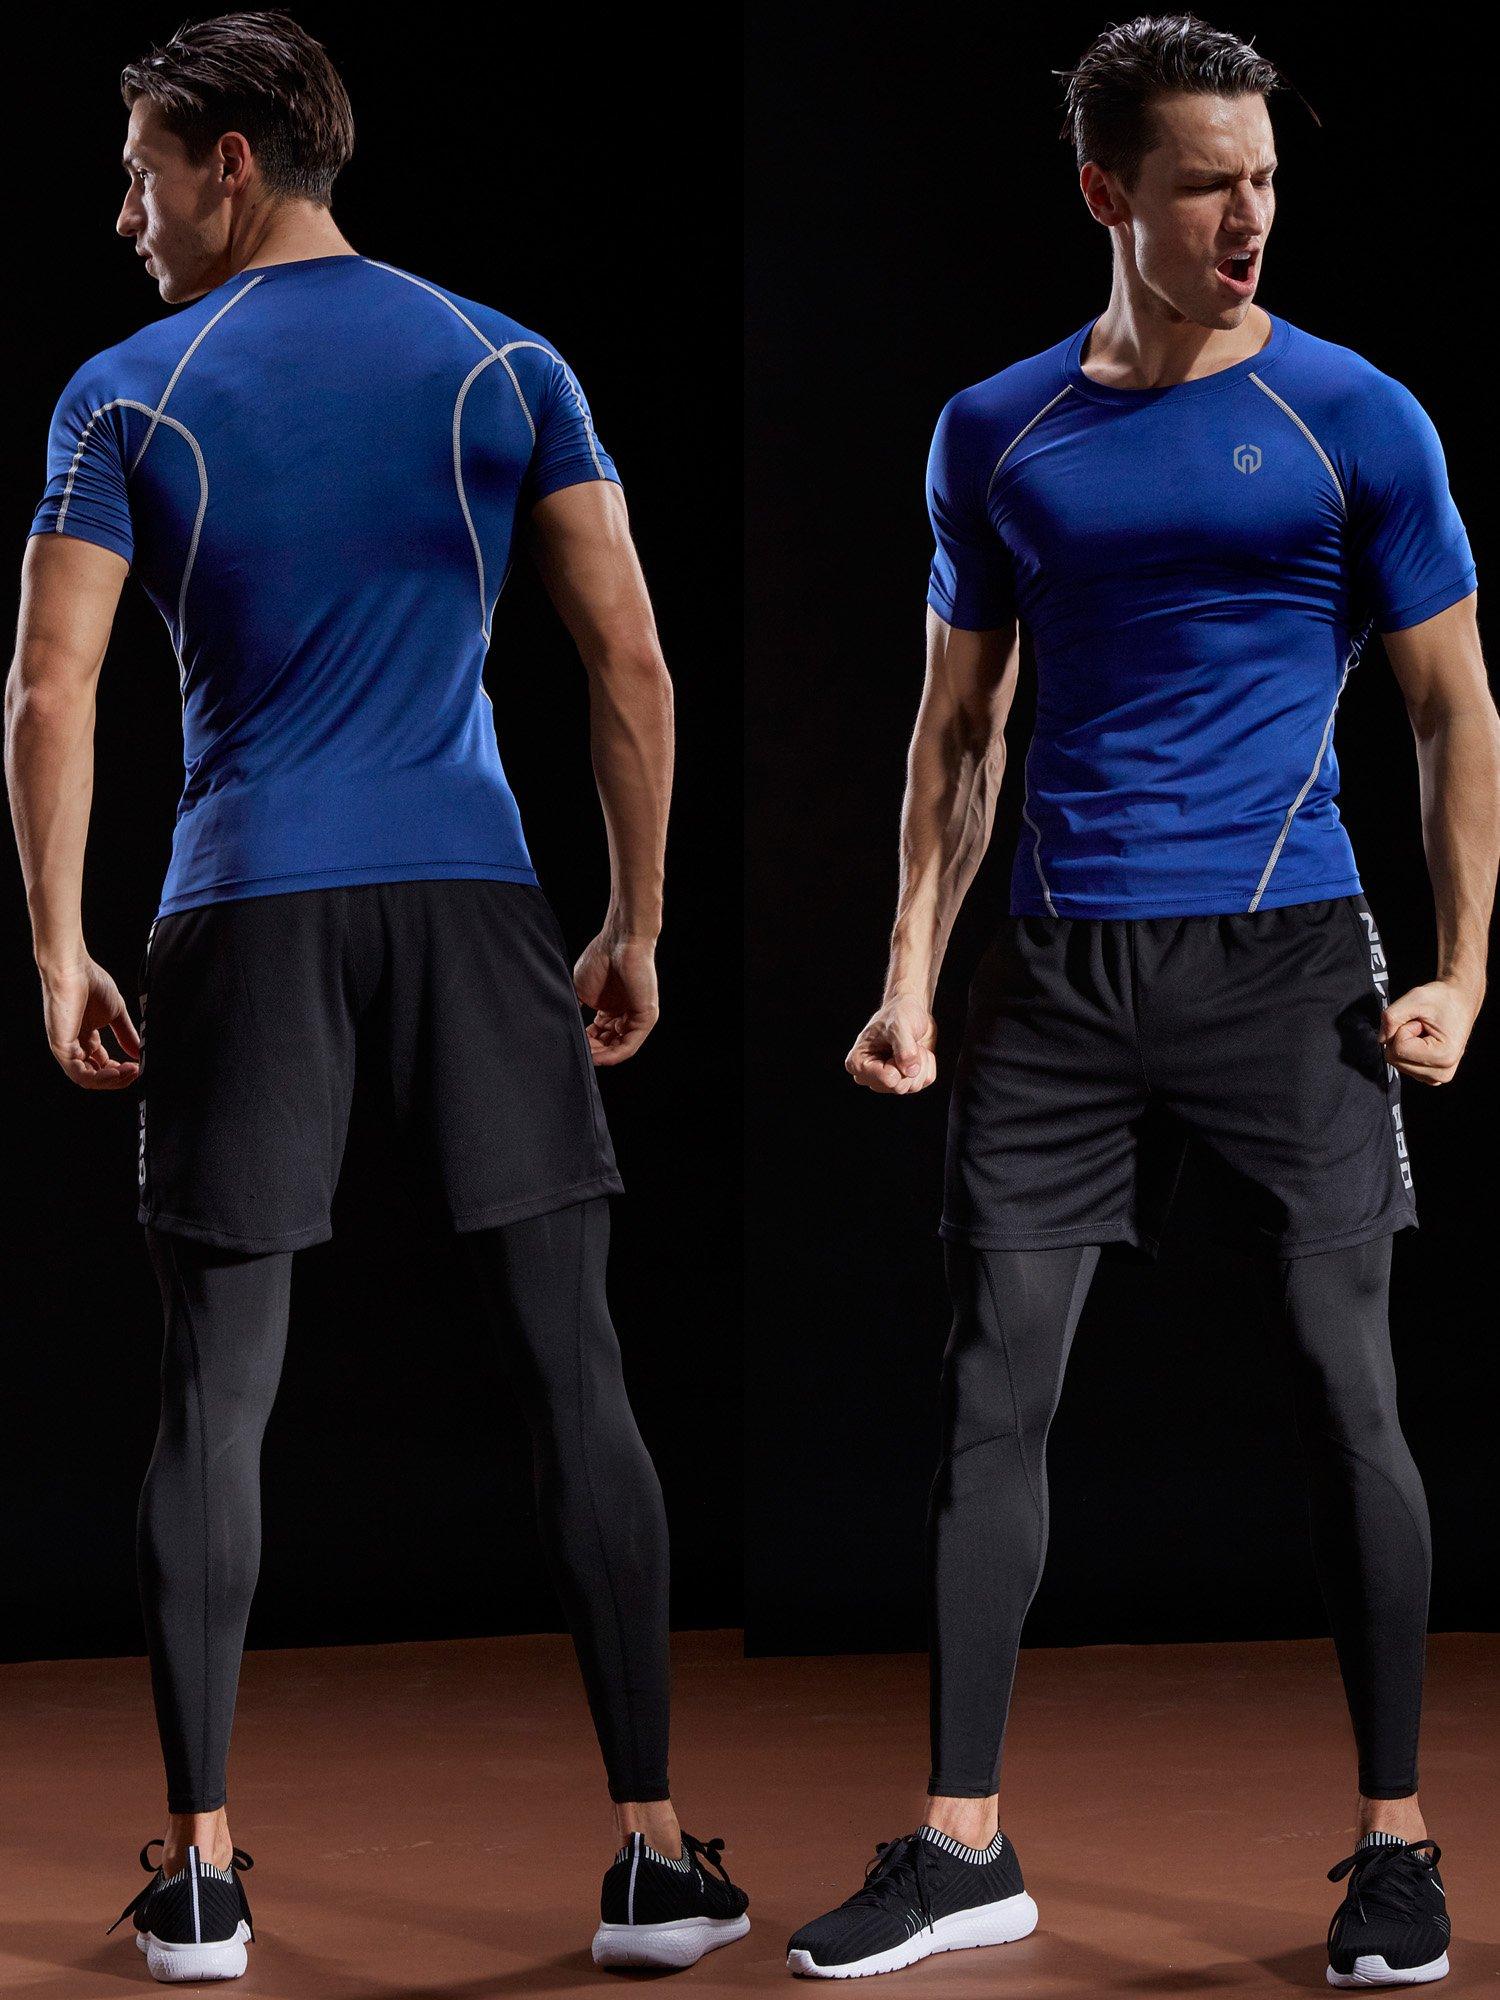 Neleus Men's 3 Pack Compression Baselayer Athletic Workout T Shirts,5022,Black,Grey,Red,S,EU M by Neleus (Image #2)